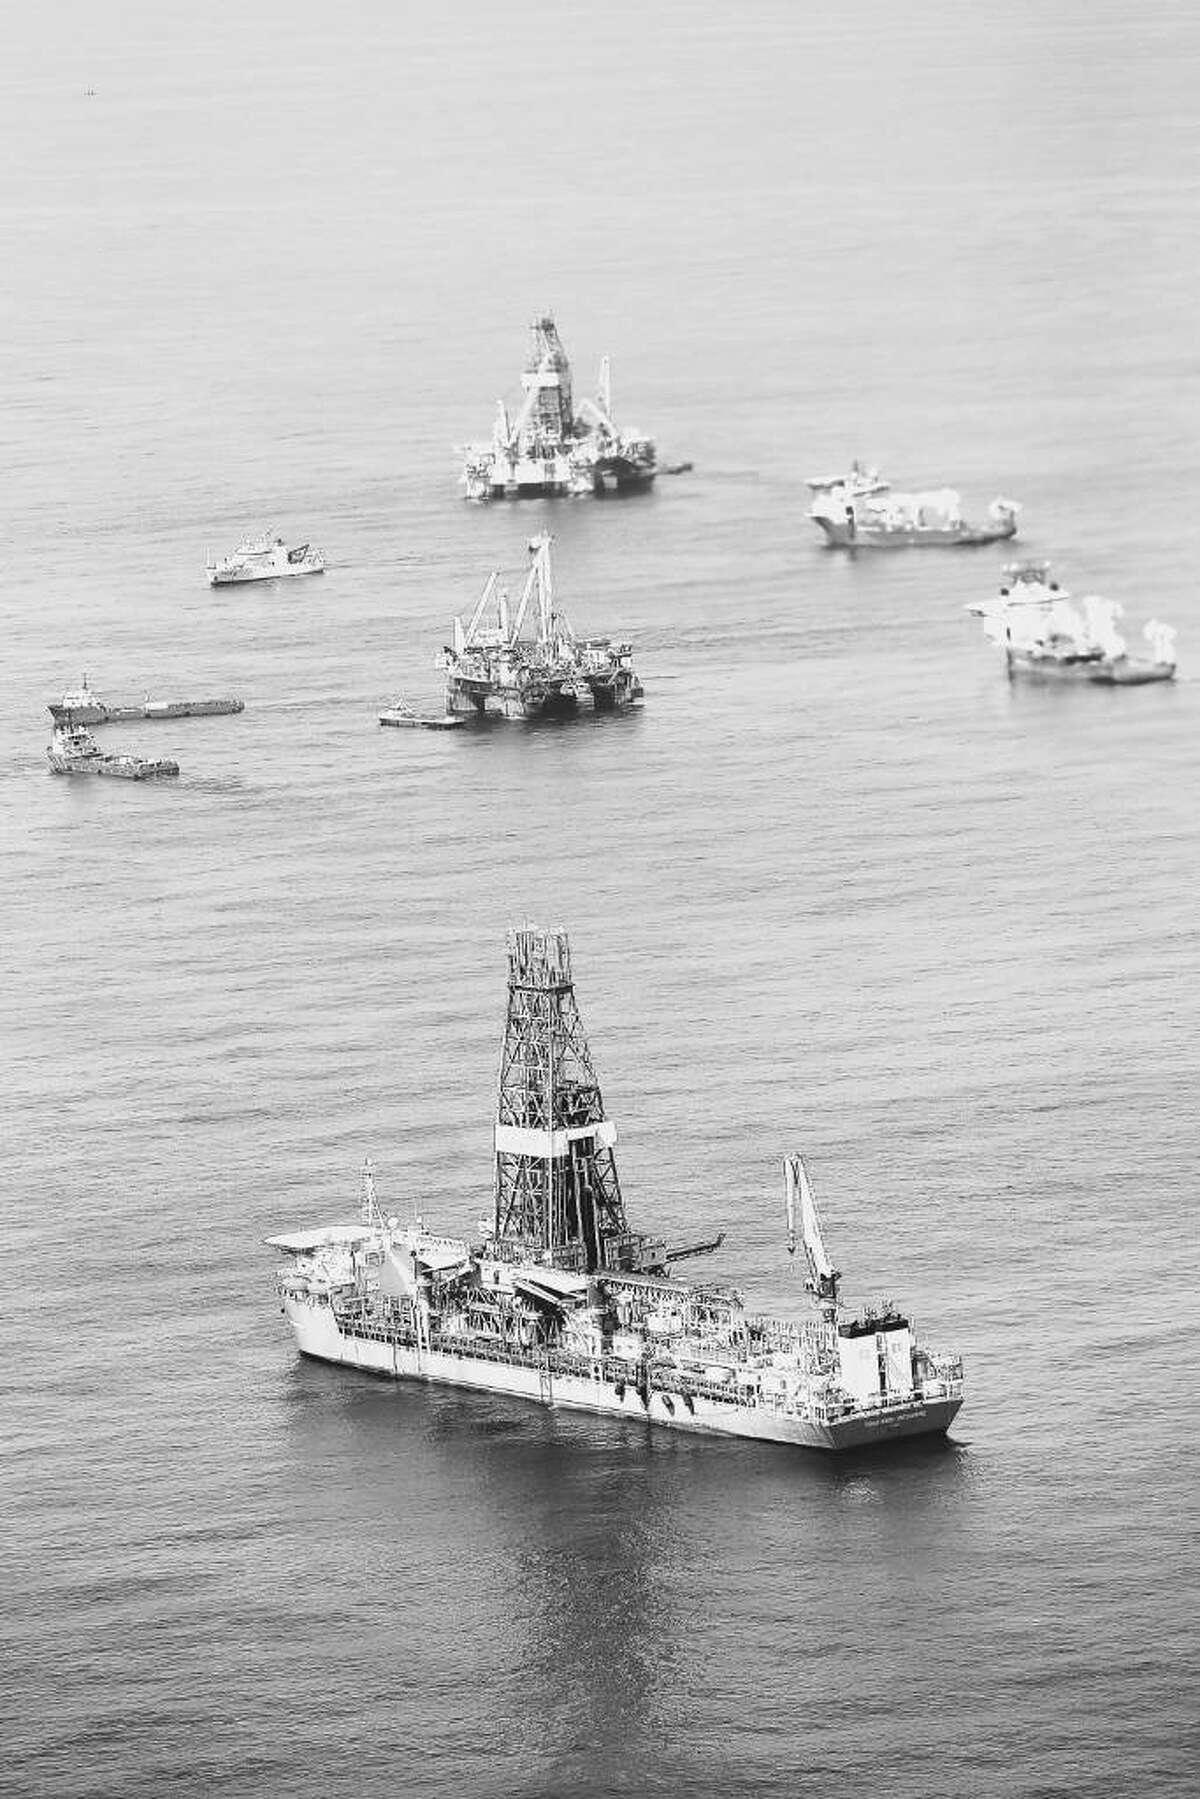 THE BP Deepwater Horizon oil spill has provided plenty of fodder for foes of offshore drilling. CHRIS GRAYTHEN/GETTY IMAGES